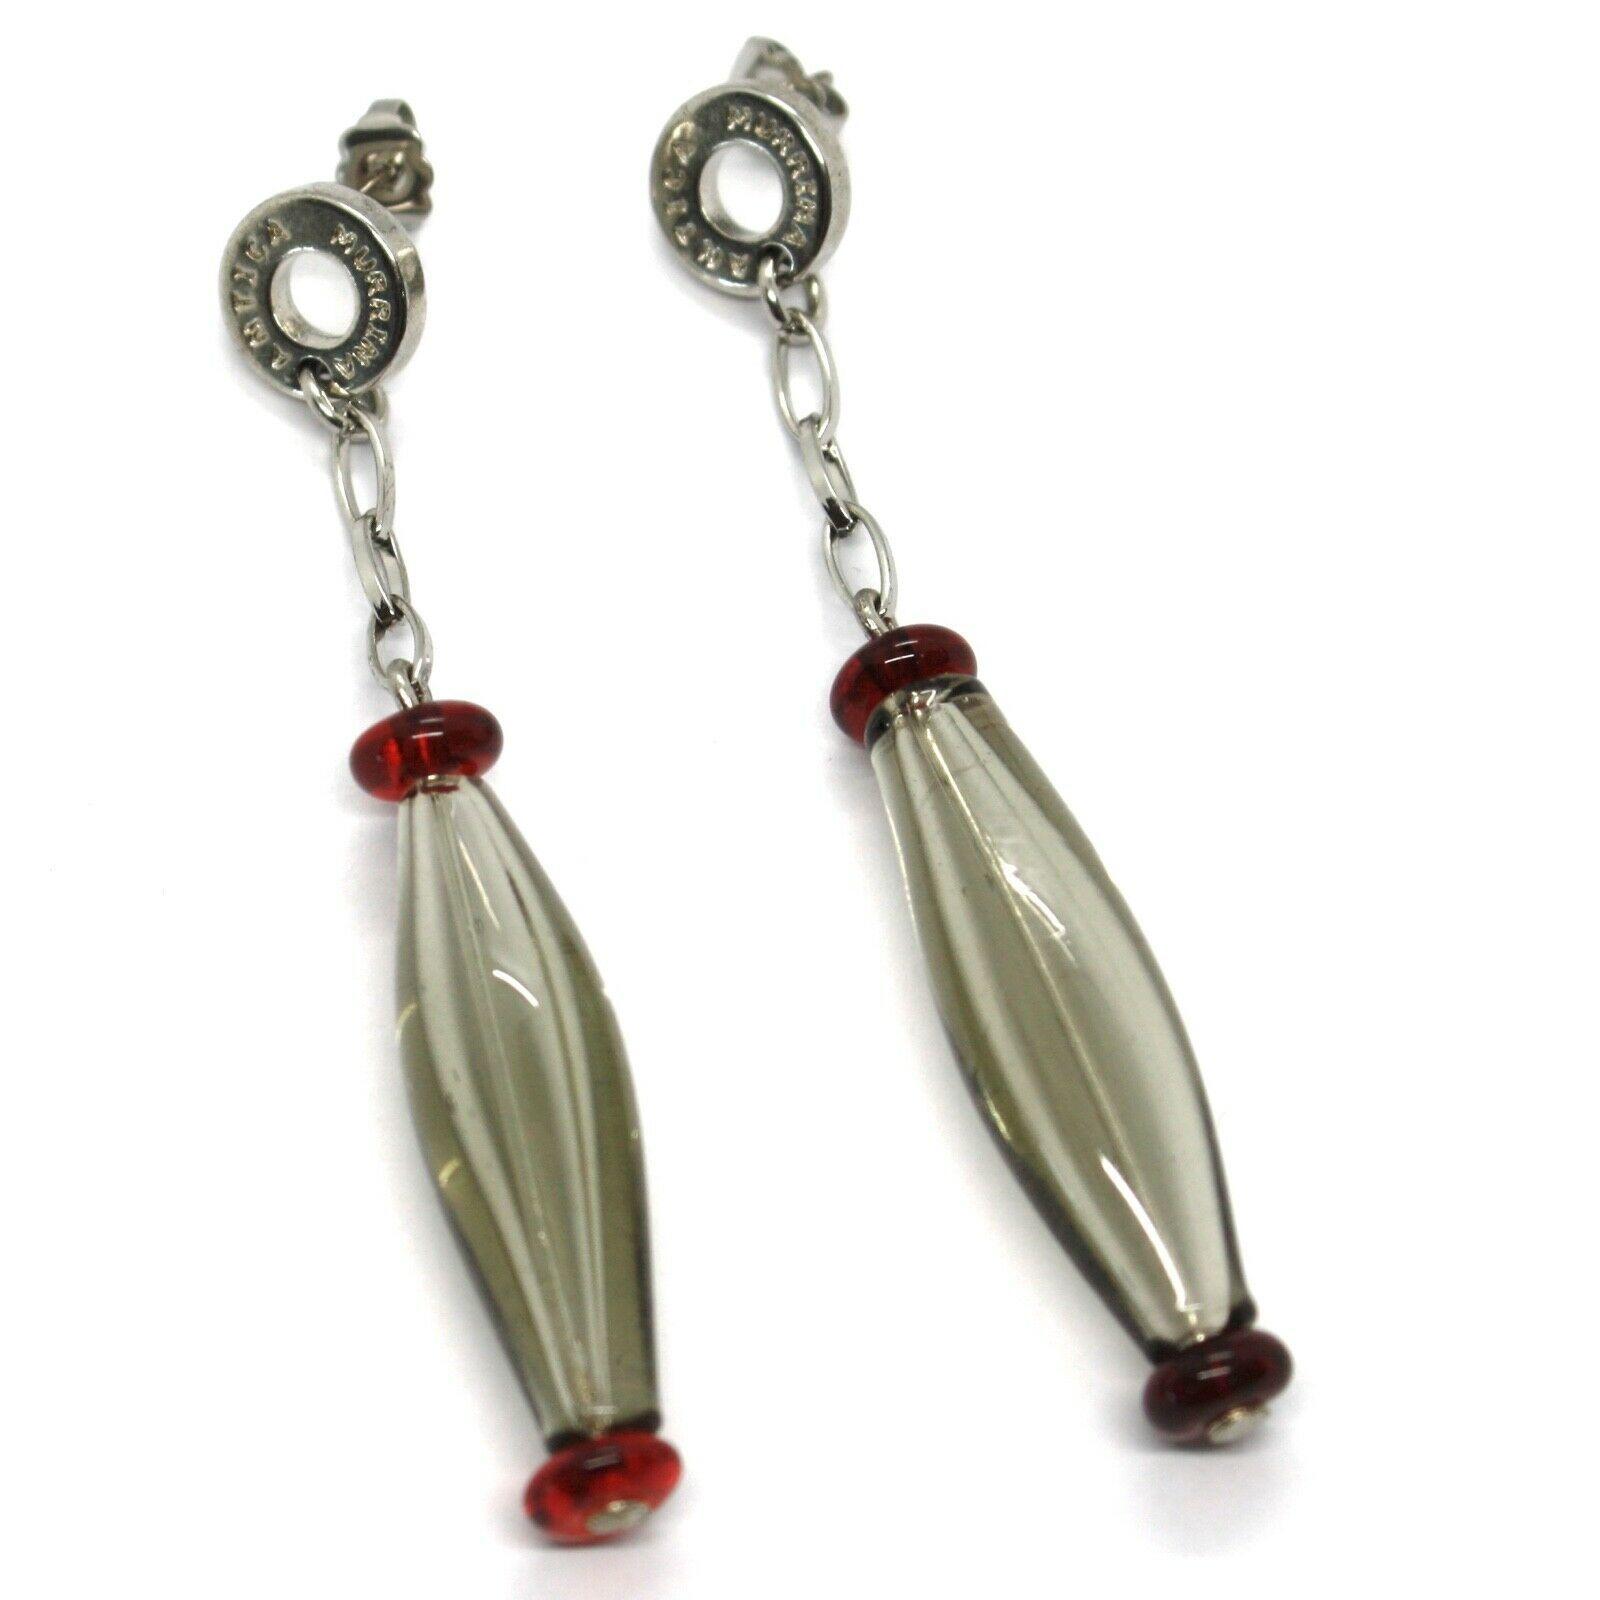 Earrings Antica Murrina Venezia, Hanging, Ovals Elongated, Gray Red